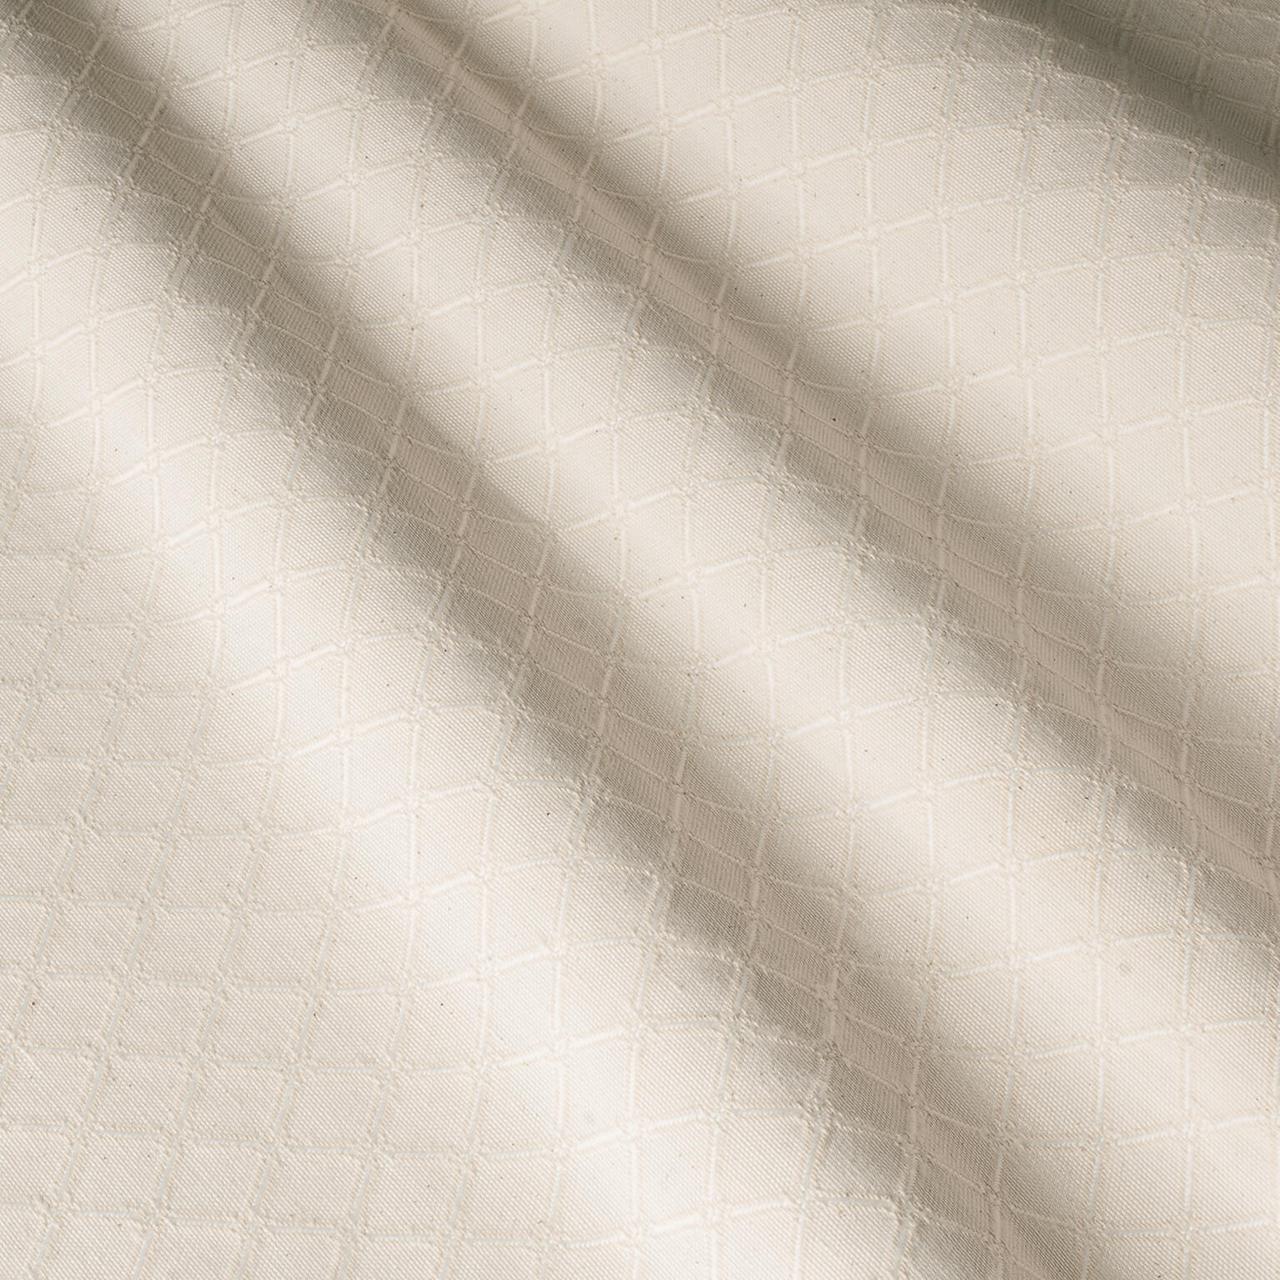 Ткань для скатертей и салфеток (ресторан) 400101 v2